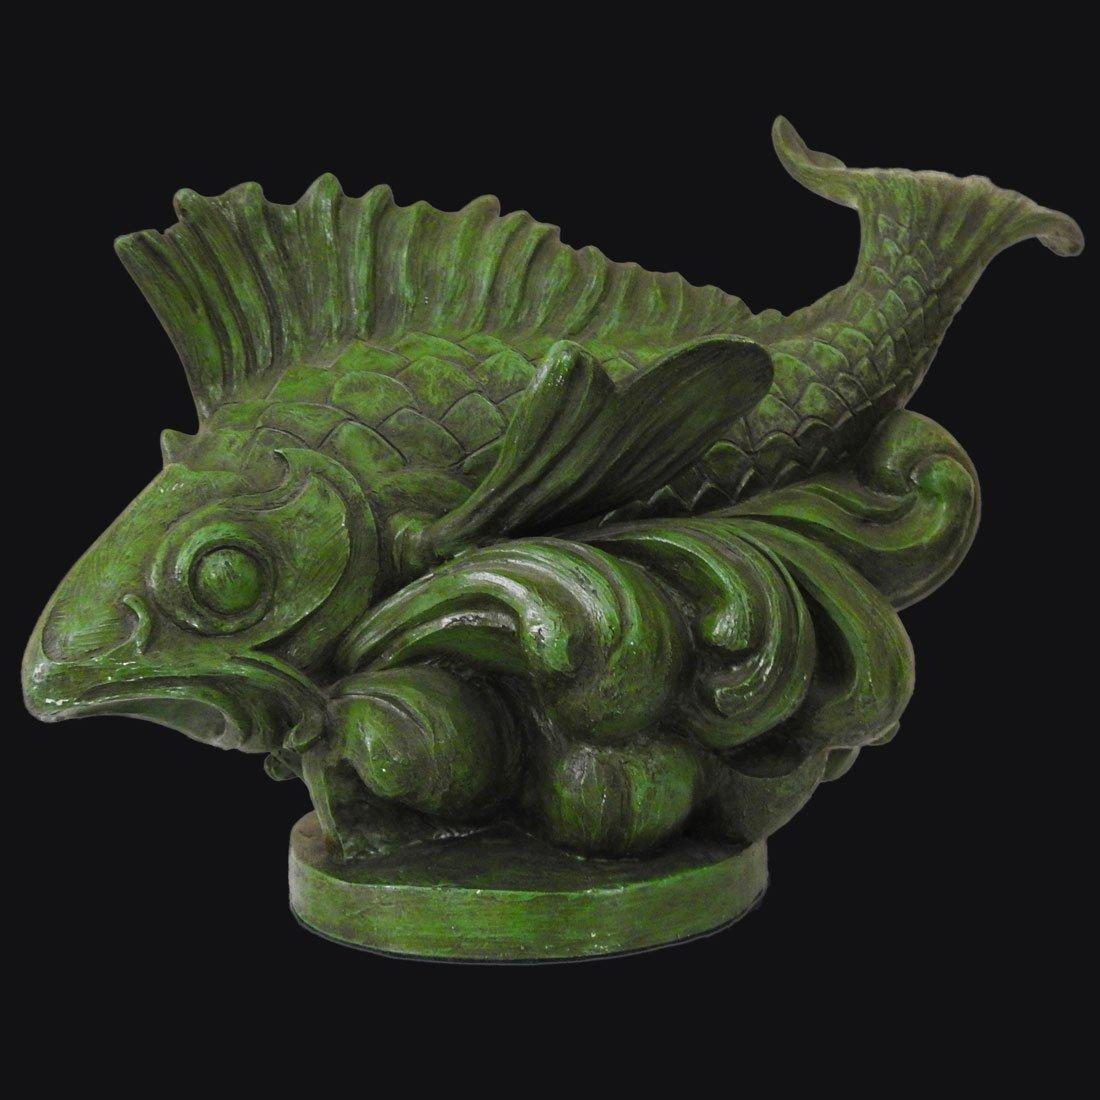 Escultura pequeño formato Pez